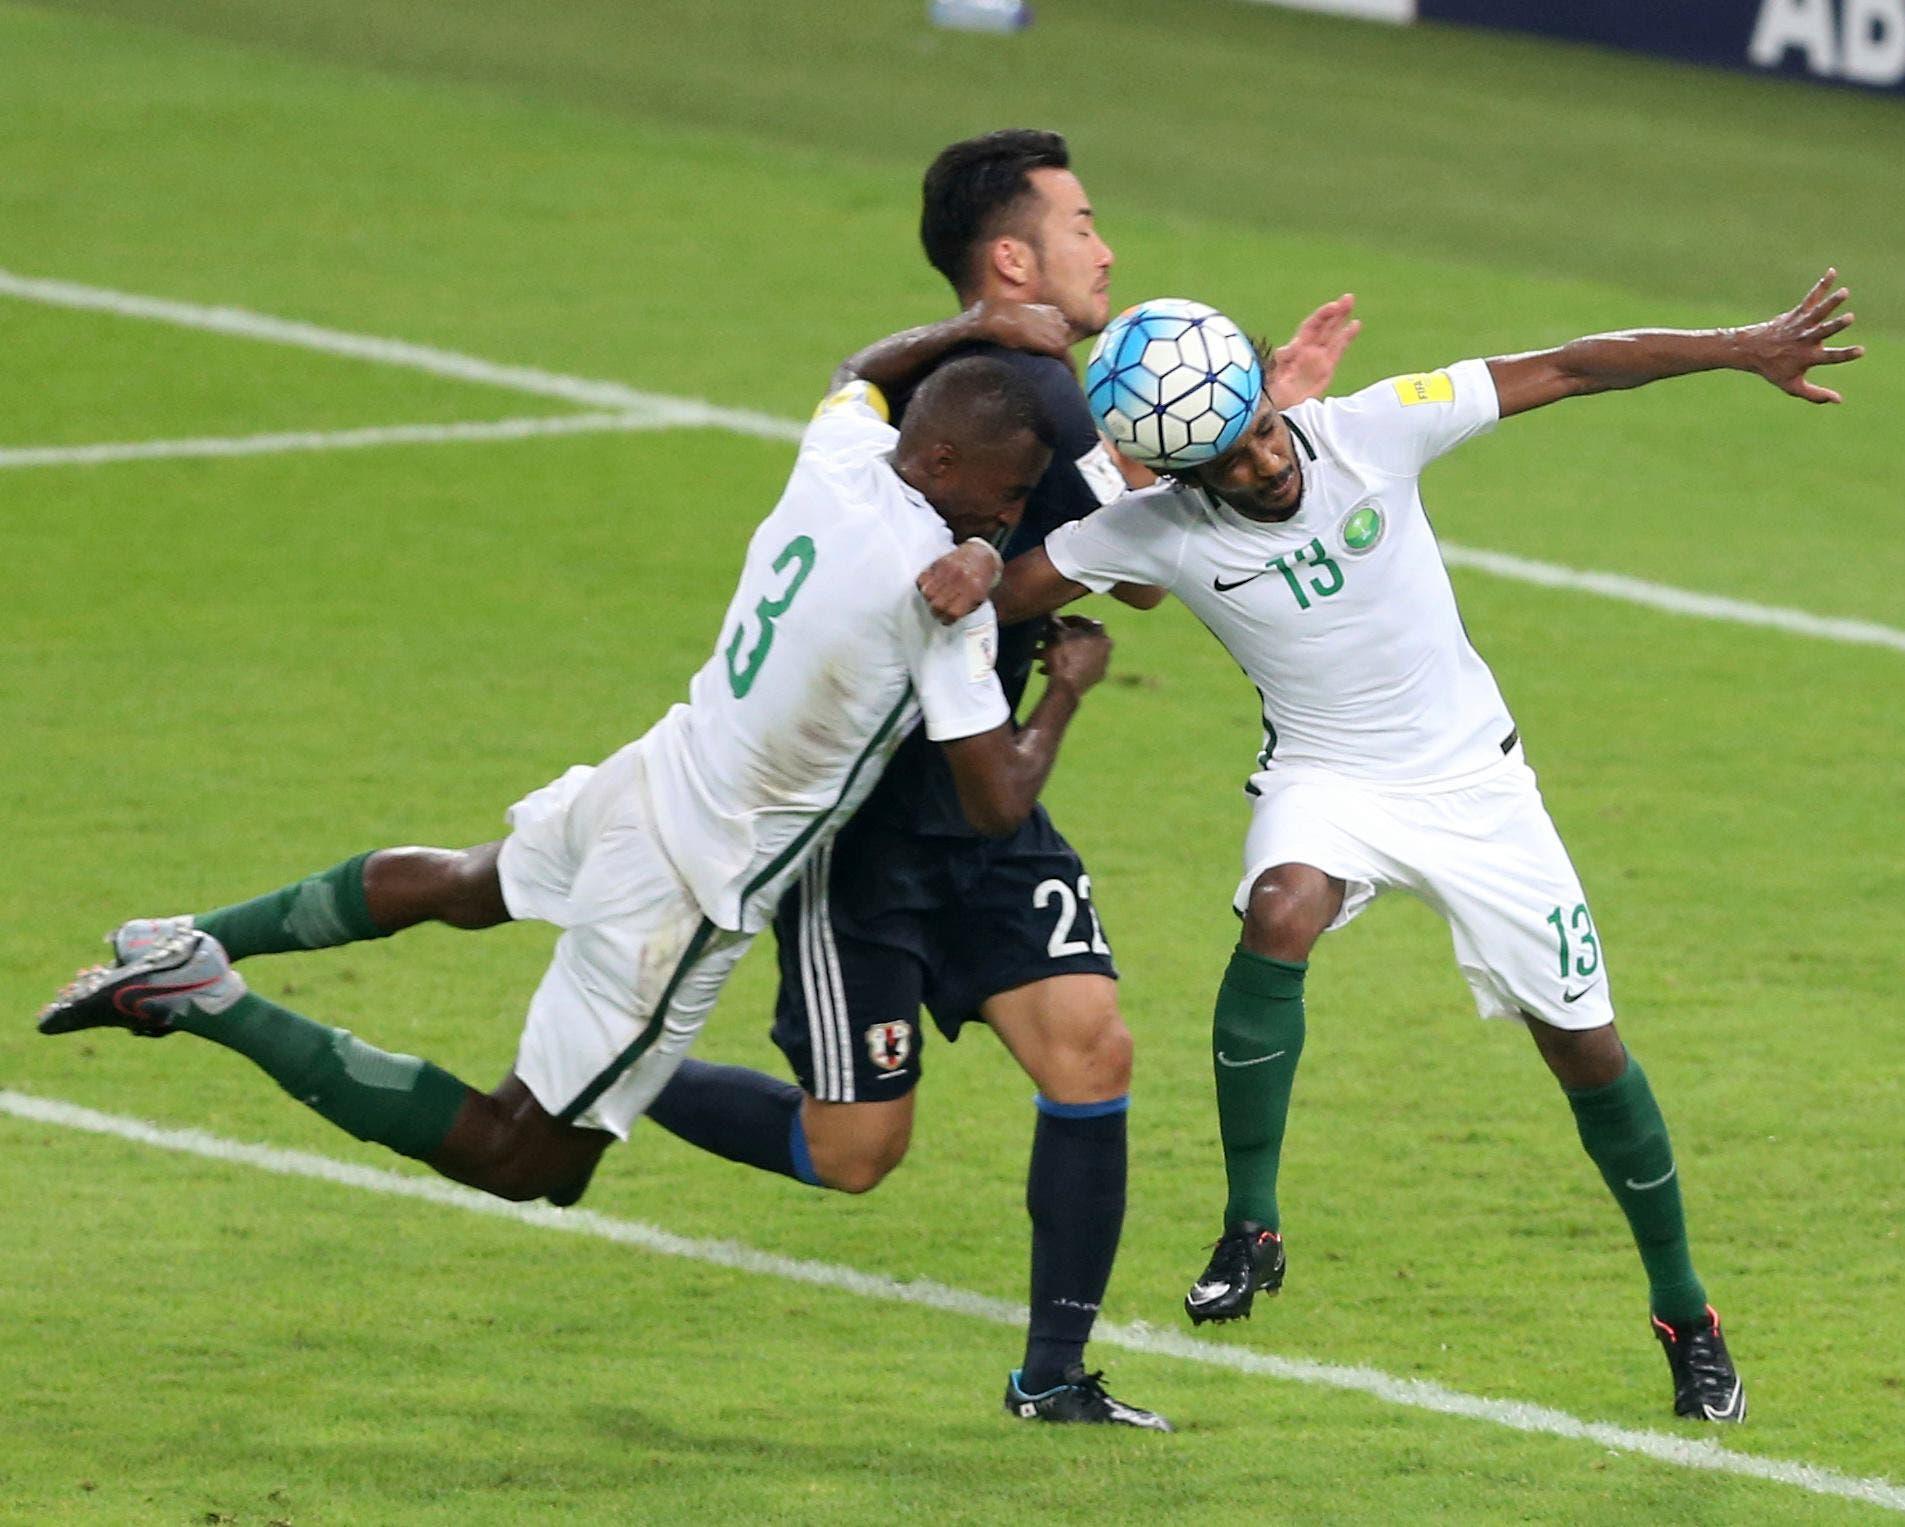 Japan's Maya Yoshida fights for the ball against Saudi Arabia's Osama Hawsawi, left, and Yasir Al Shahrani during the 2018 World Cup group B qualifying soccer match between Saudi Arabia and Japan. (AP)